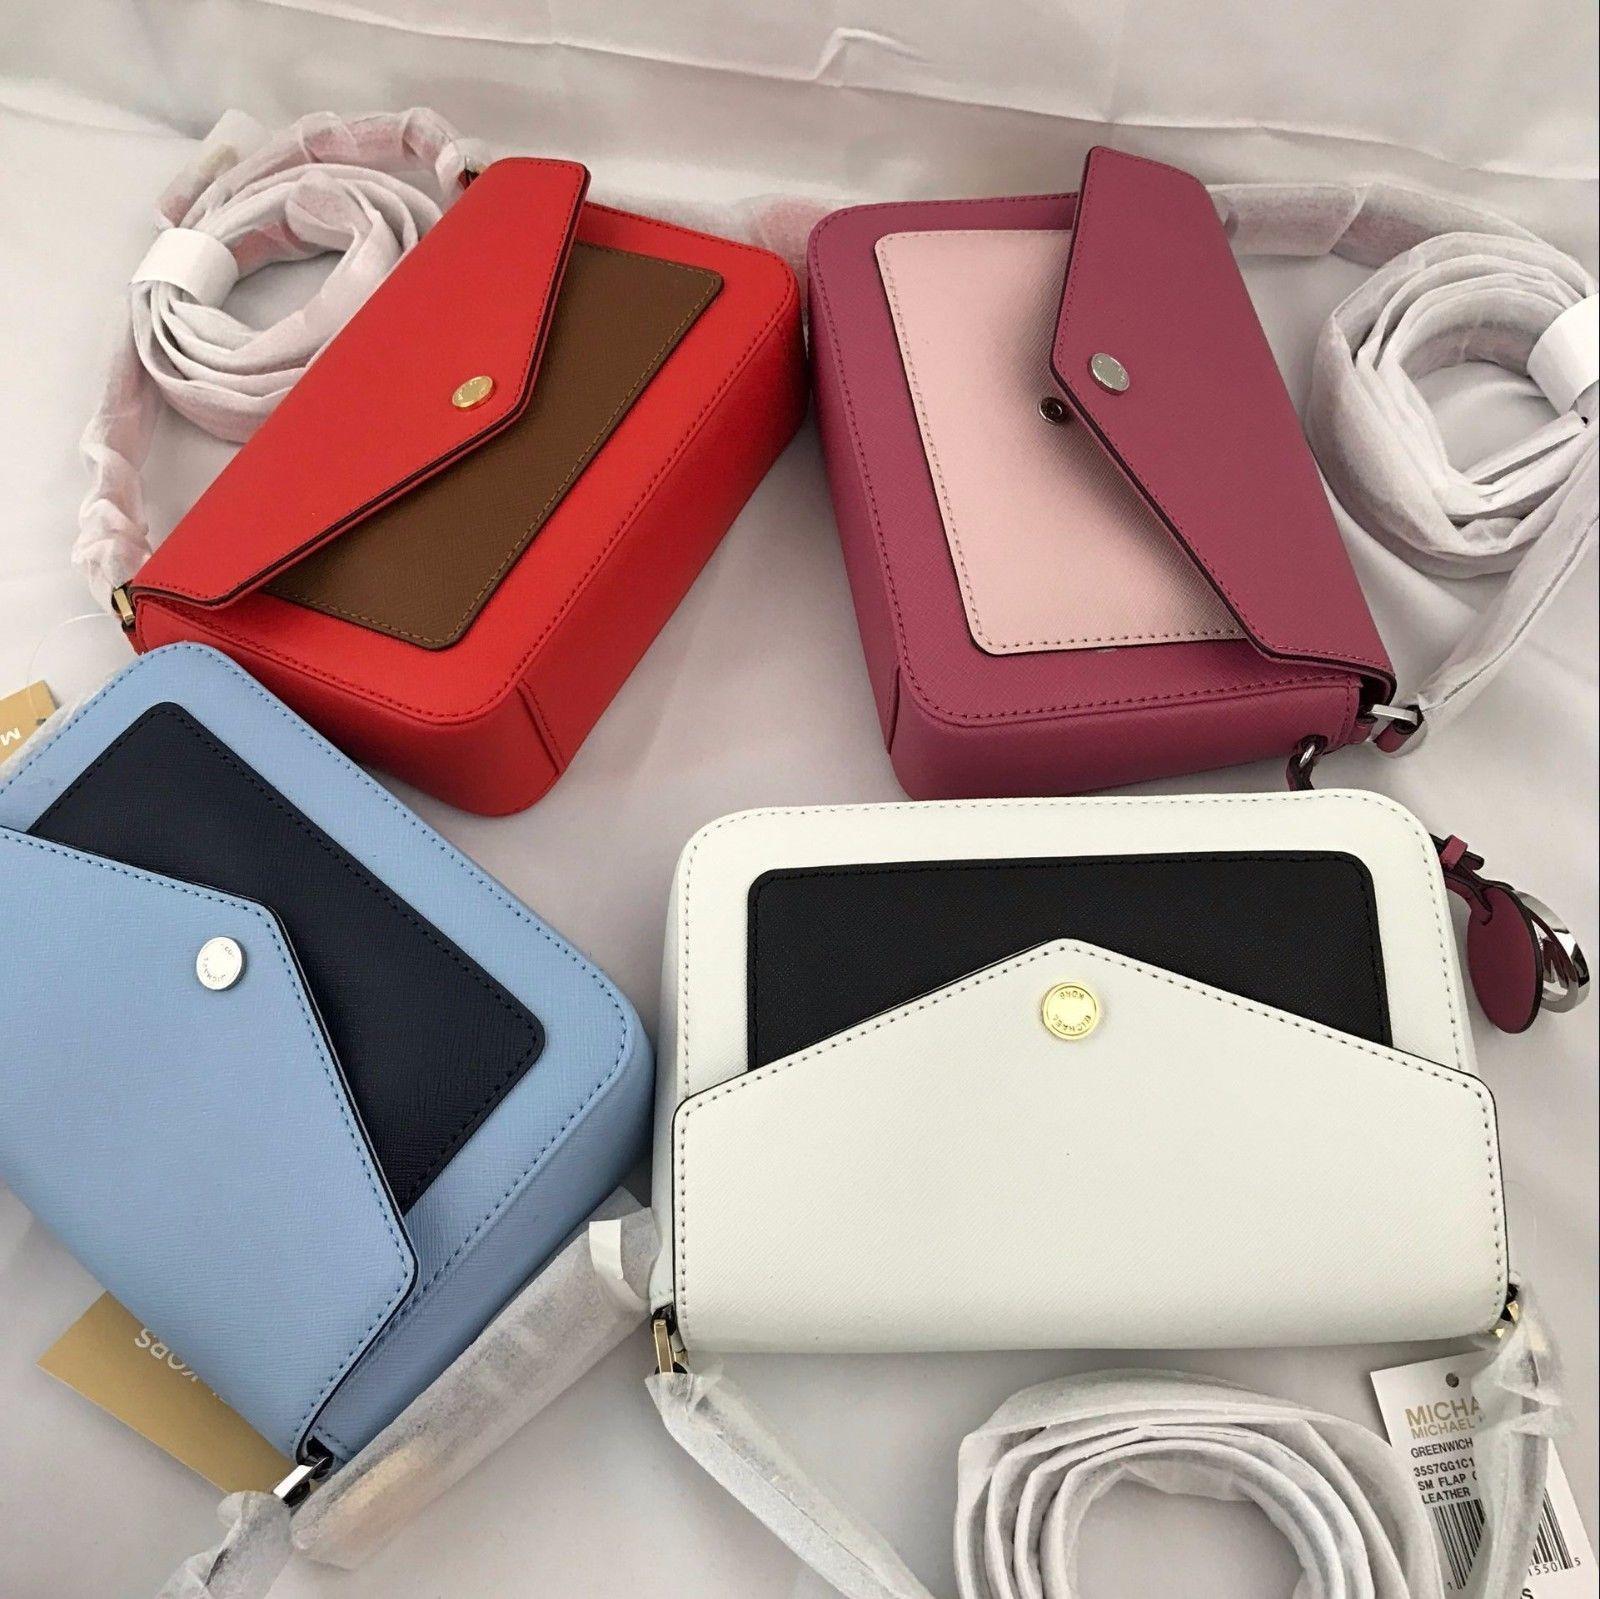 1f1fc696b13195 Nwt 2017 Michael Kors Greenwich Color Pocket and 50 similar items. S l1600